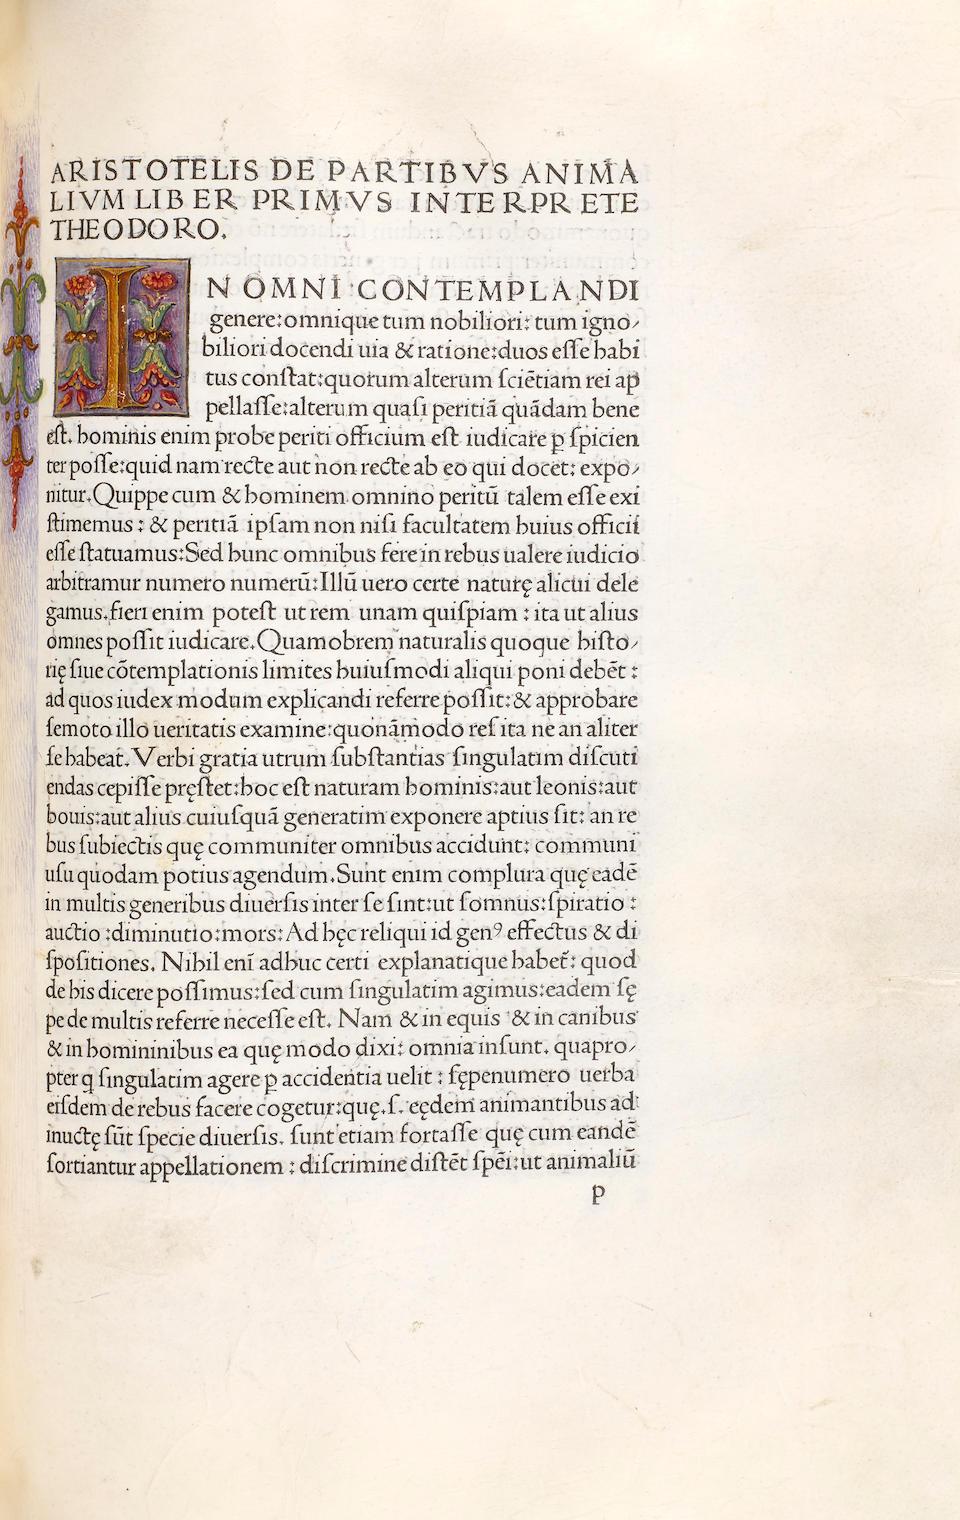 ARISTOTLE. 384-322 B.C.E. De animalibus [De historia animalium. De partibus animalium. De generatione animalium.] Translated by Theodore Gaza; edited by Ludovico Prodocator. Venice: Johannes de Colonia and Johannes Manthen de Gheretzem, 1476.